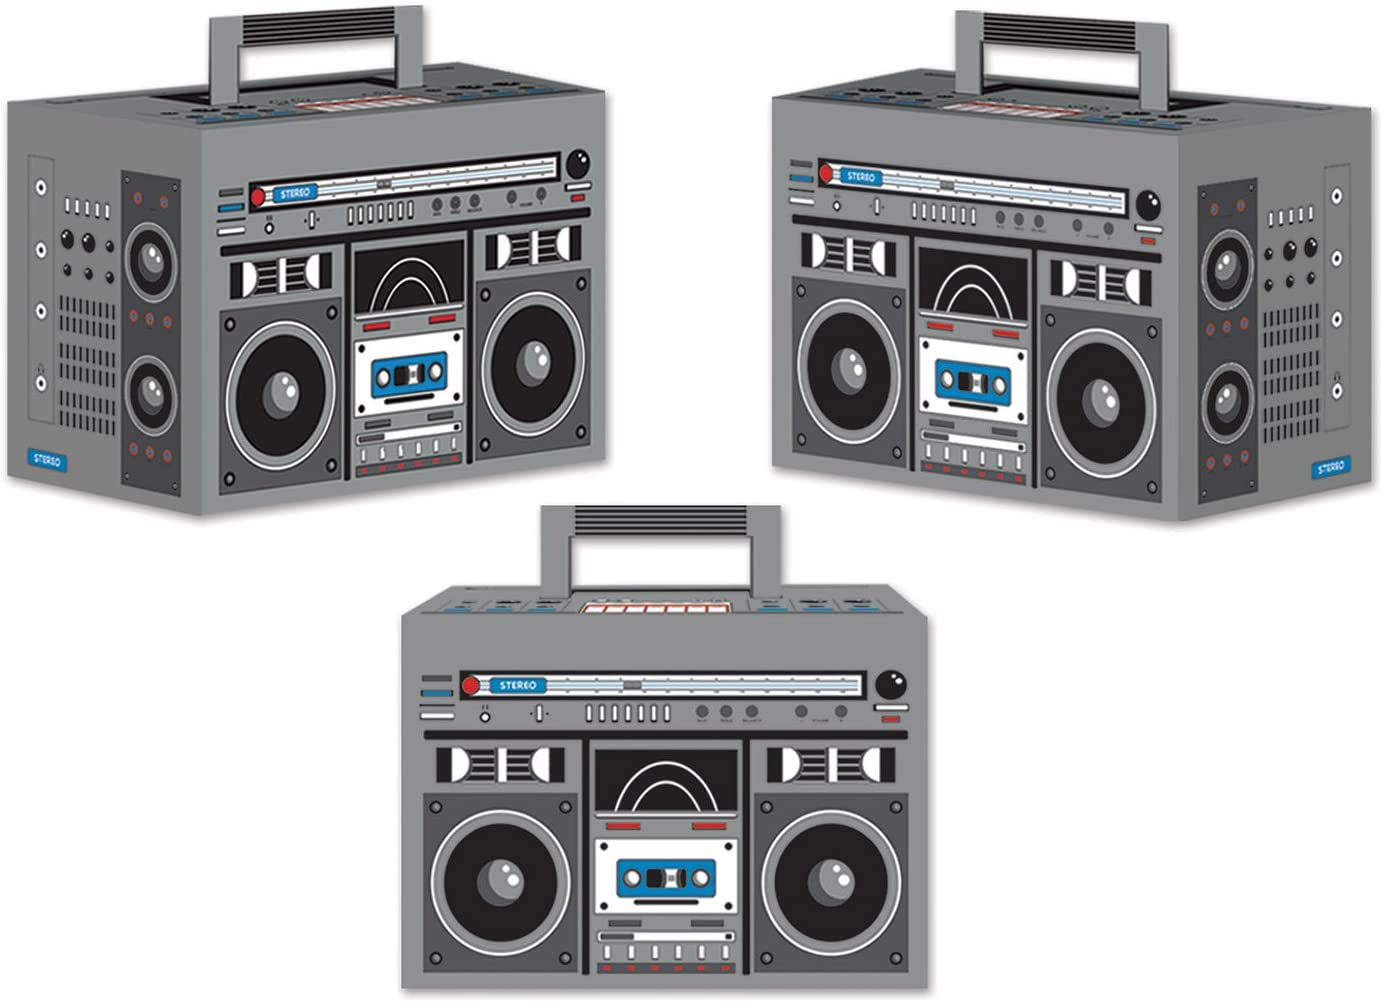 "Beistle Novelty Boom Favor Boxes 3 Piece – 80's Theme Retro Decorations – 1980's Hip Hop Party Supplies Table Centerpieces, 4"" x 5.75"", Gray/Black/Red/Blue/White"